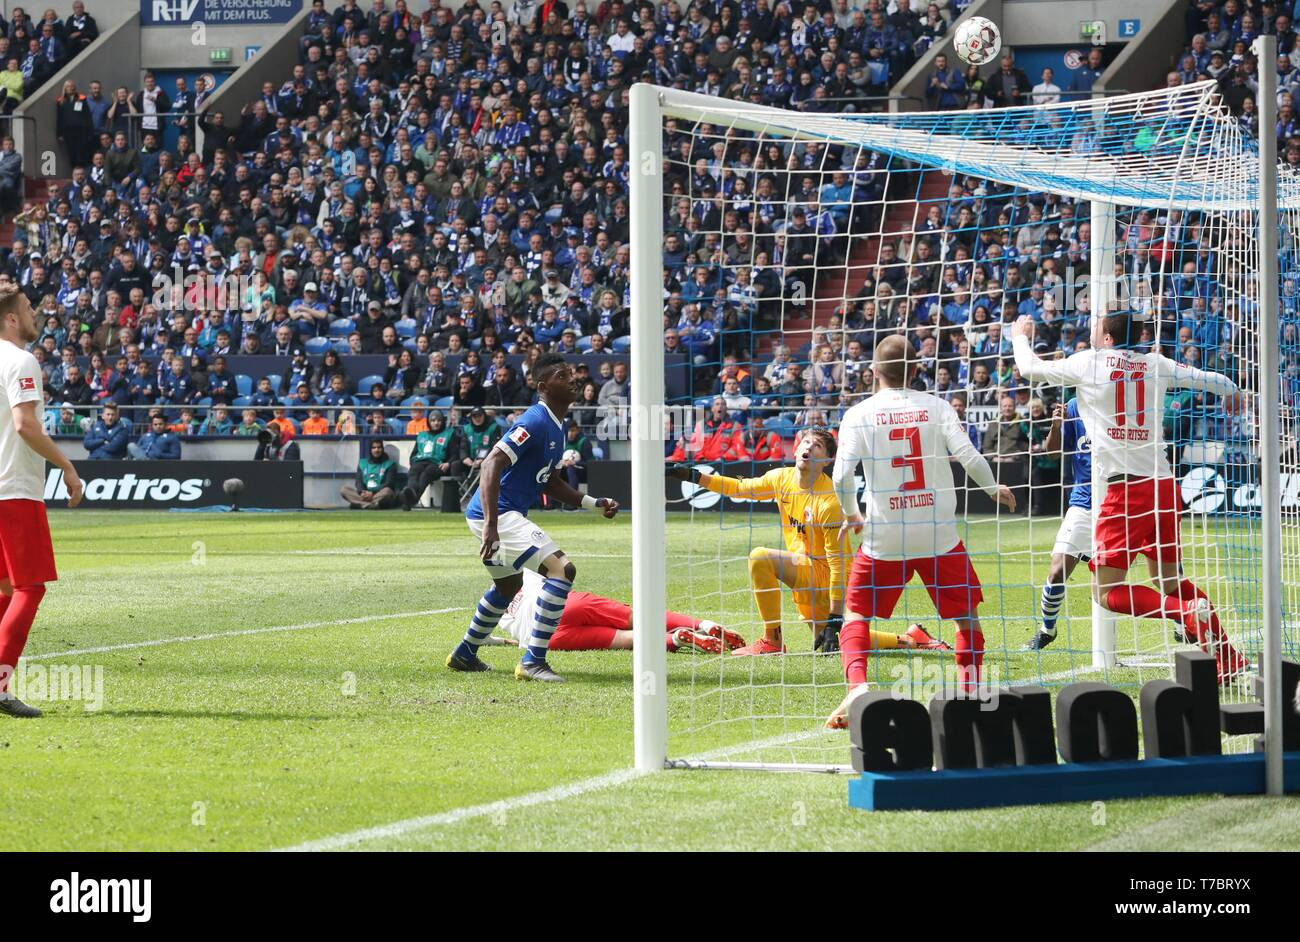 firo: 05.05.2019, Football, 2018/2019, 1.Bundesliga: FC Schalke 04 - FC Augsburg goal opportunity Breel Embolo   usage worldwide - Stock Image